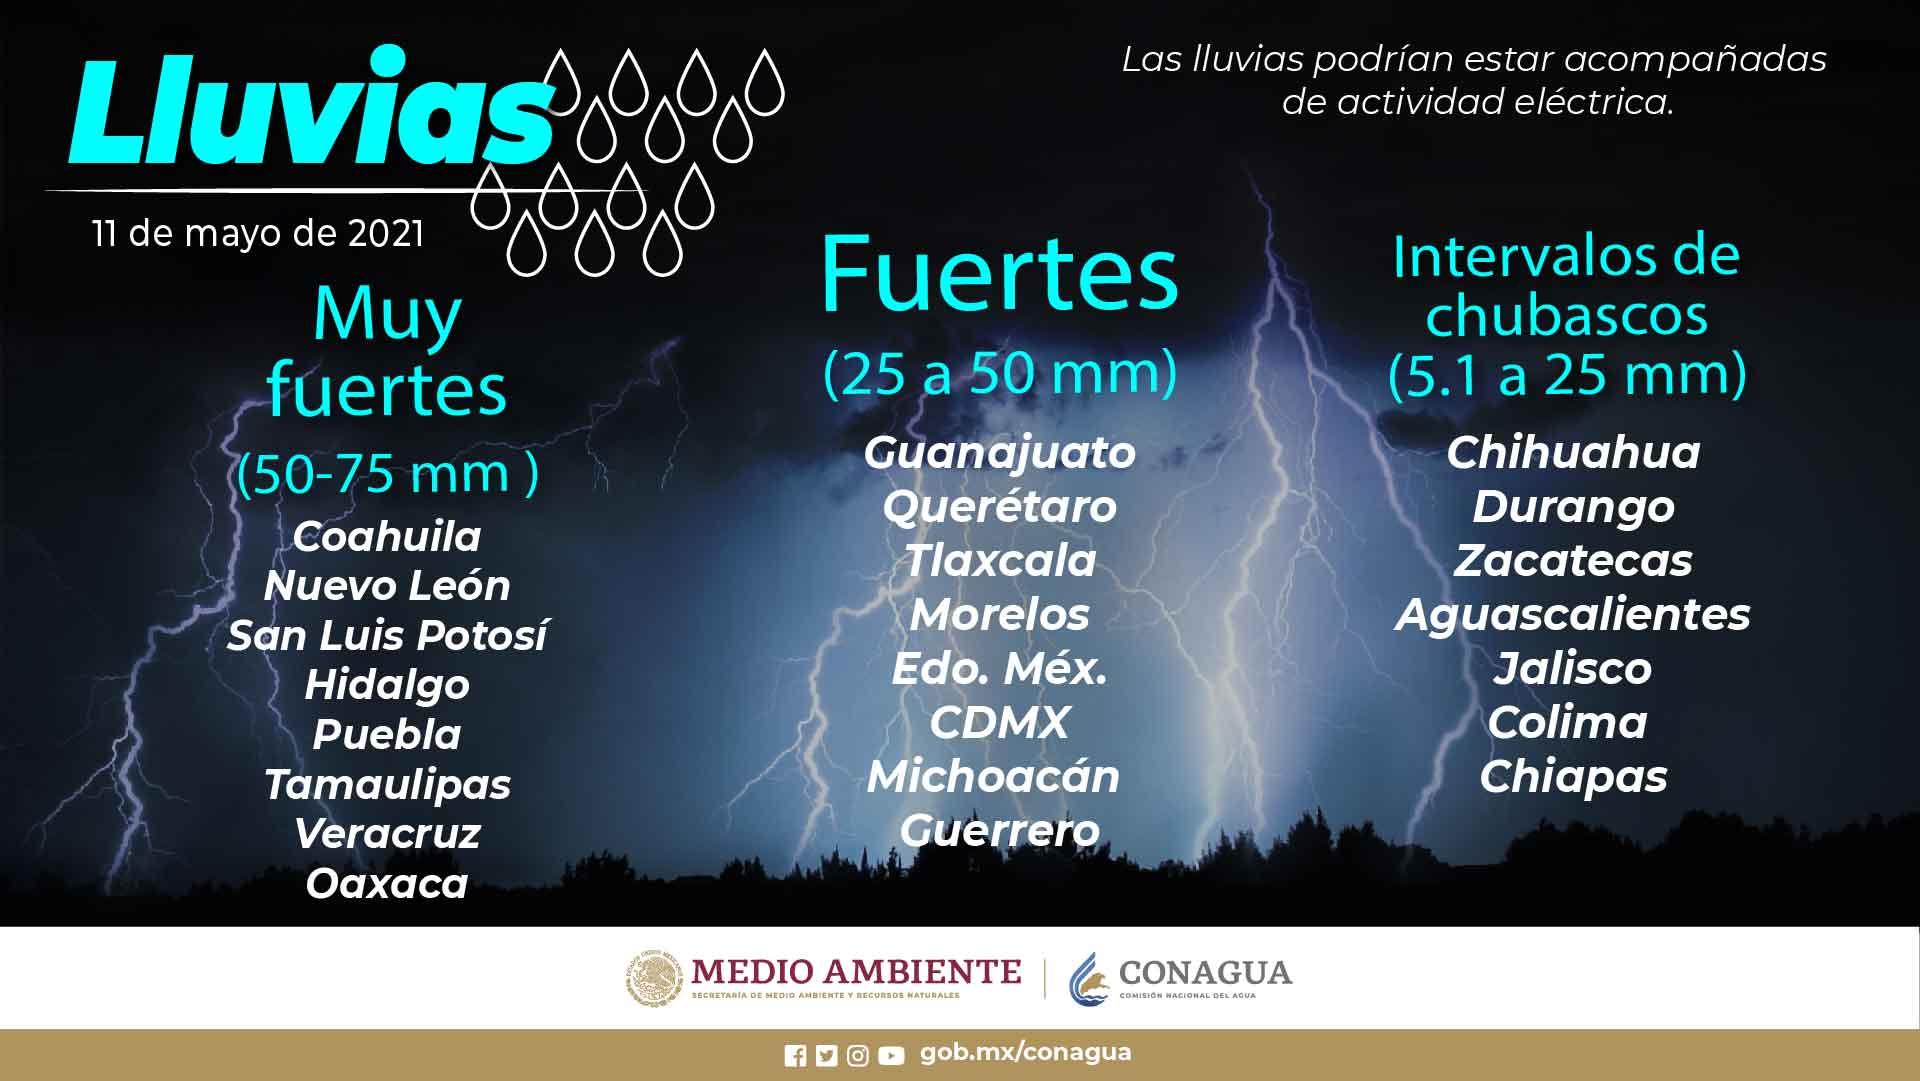 Se prevén lluvias fuertes para Tlaxcala el dia de hoy